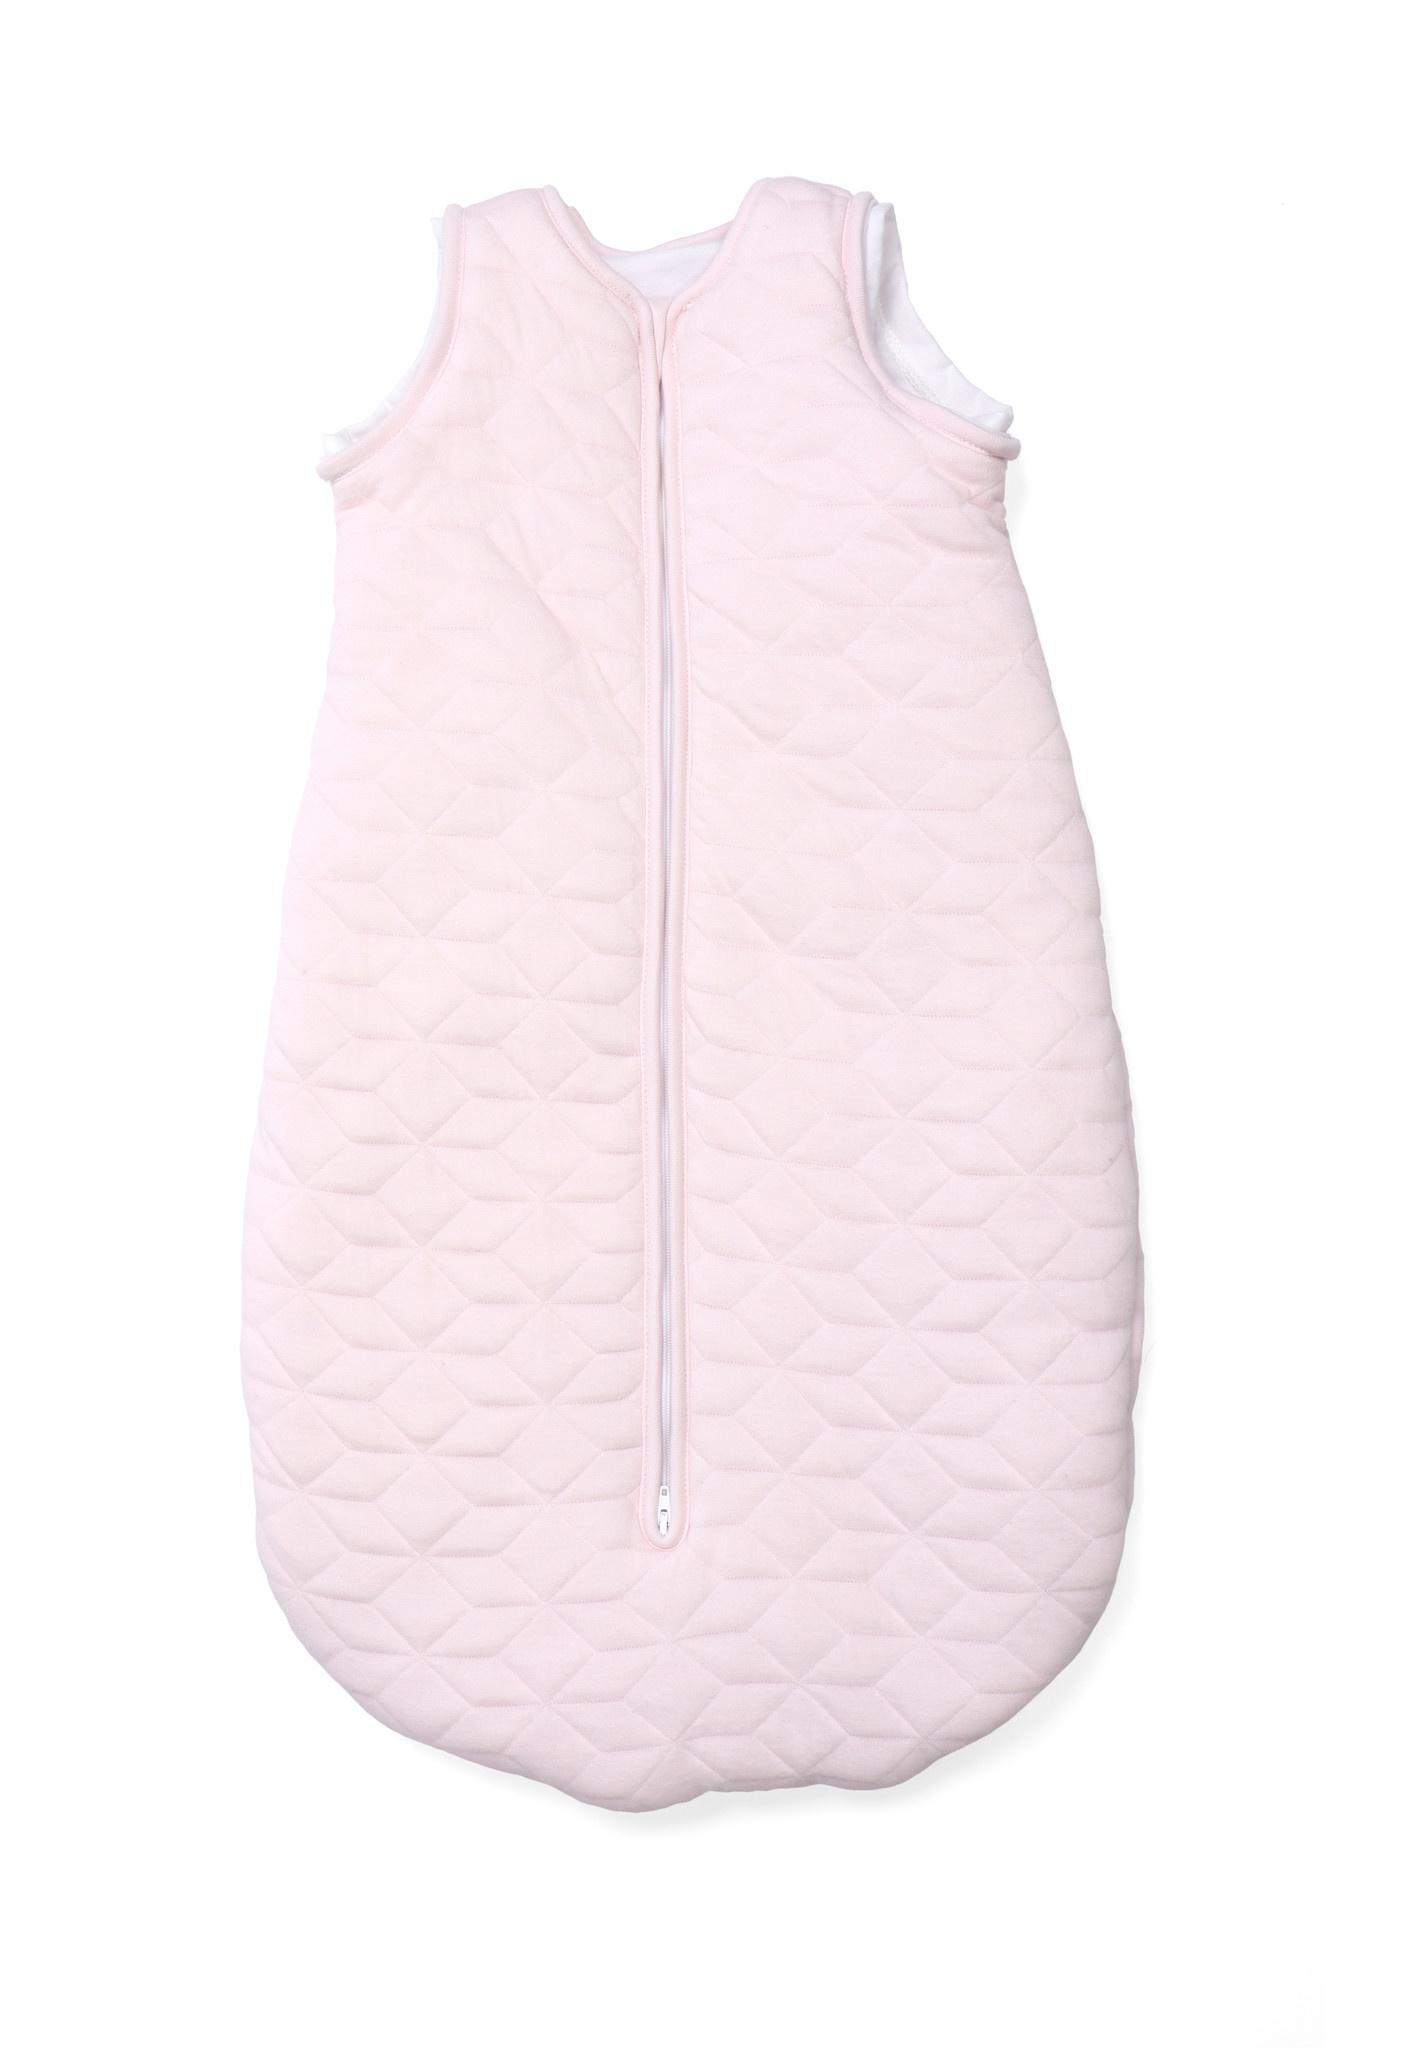 Jersey slaapzak 90cm met afritsbare mouwen Star Soft Pink-8